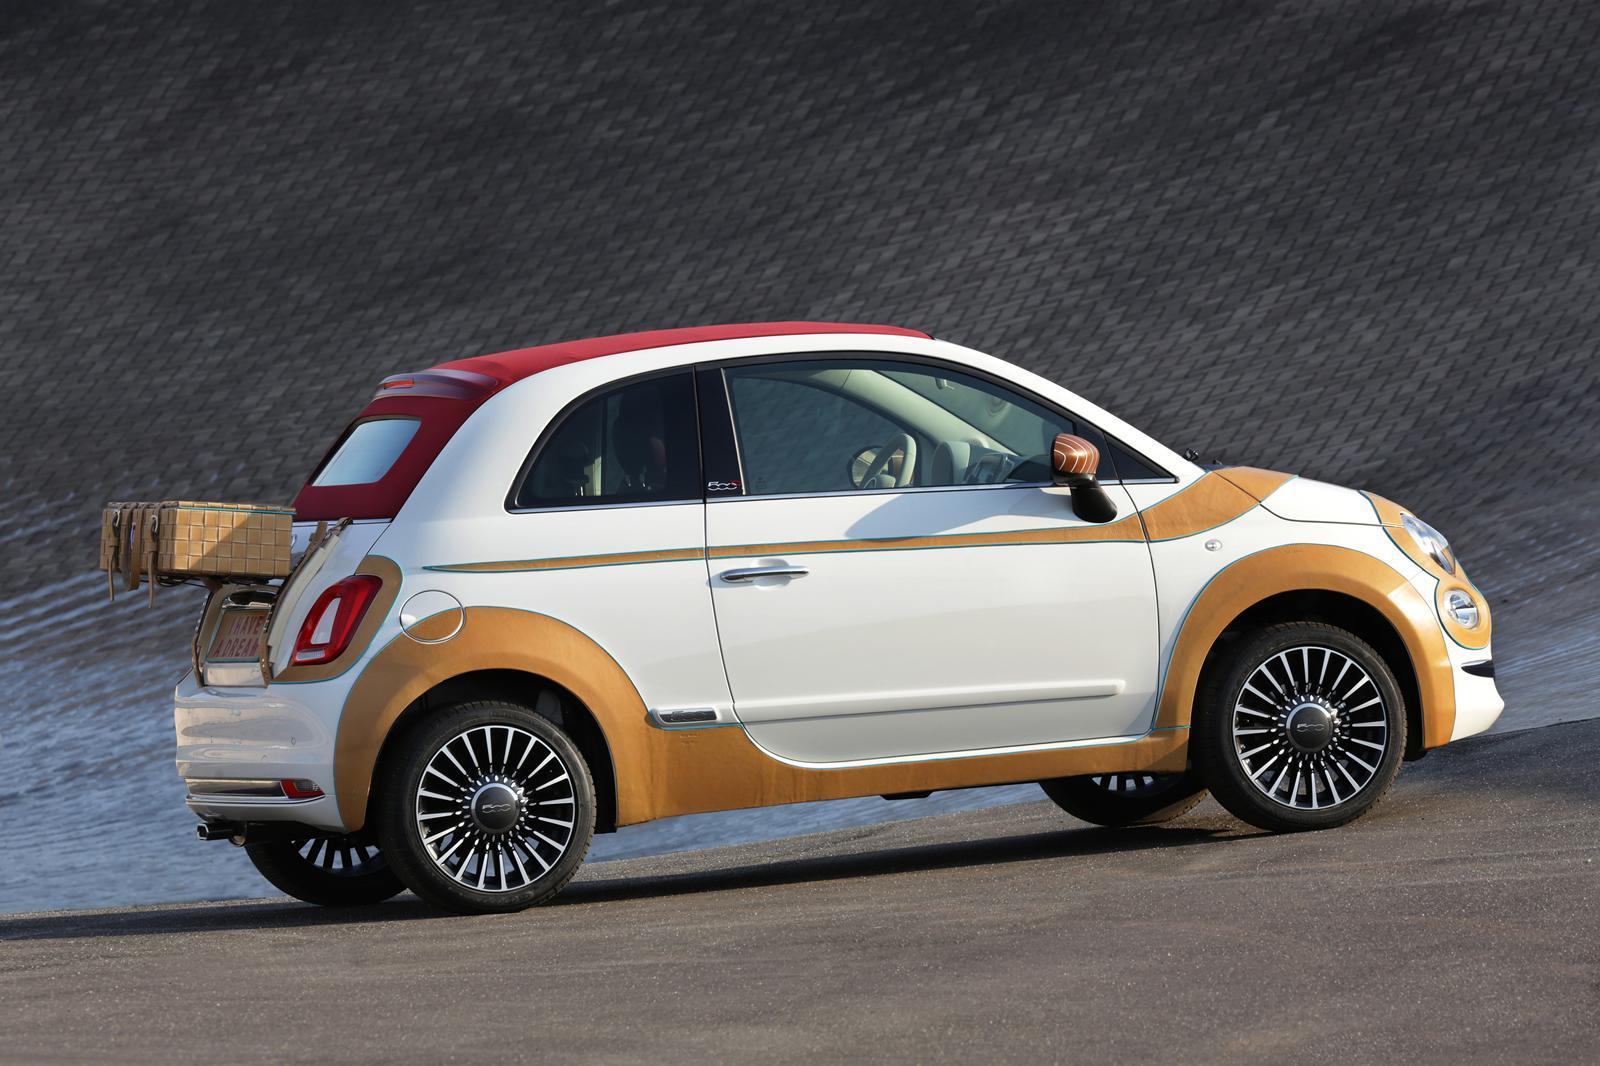 Foto de Fiat 500 x Stefano Conticelli (3/9)